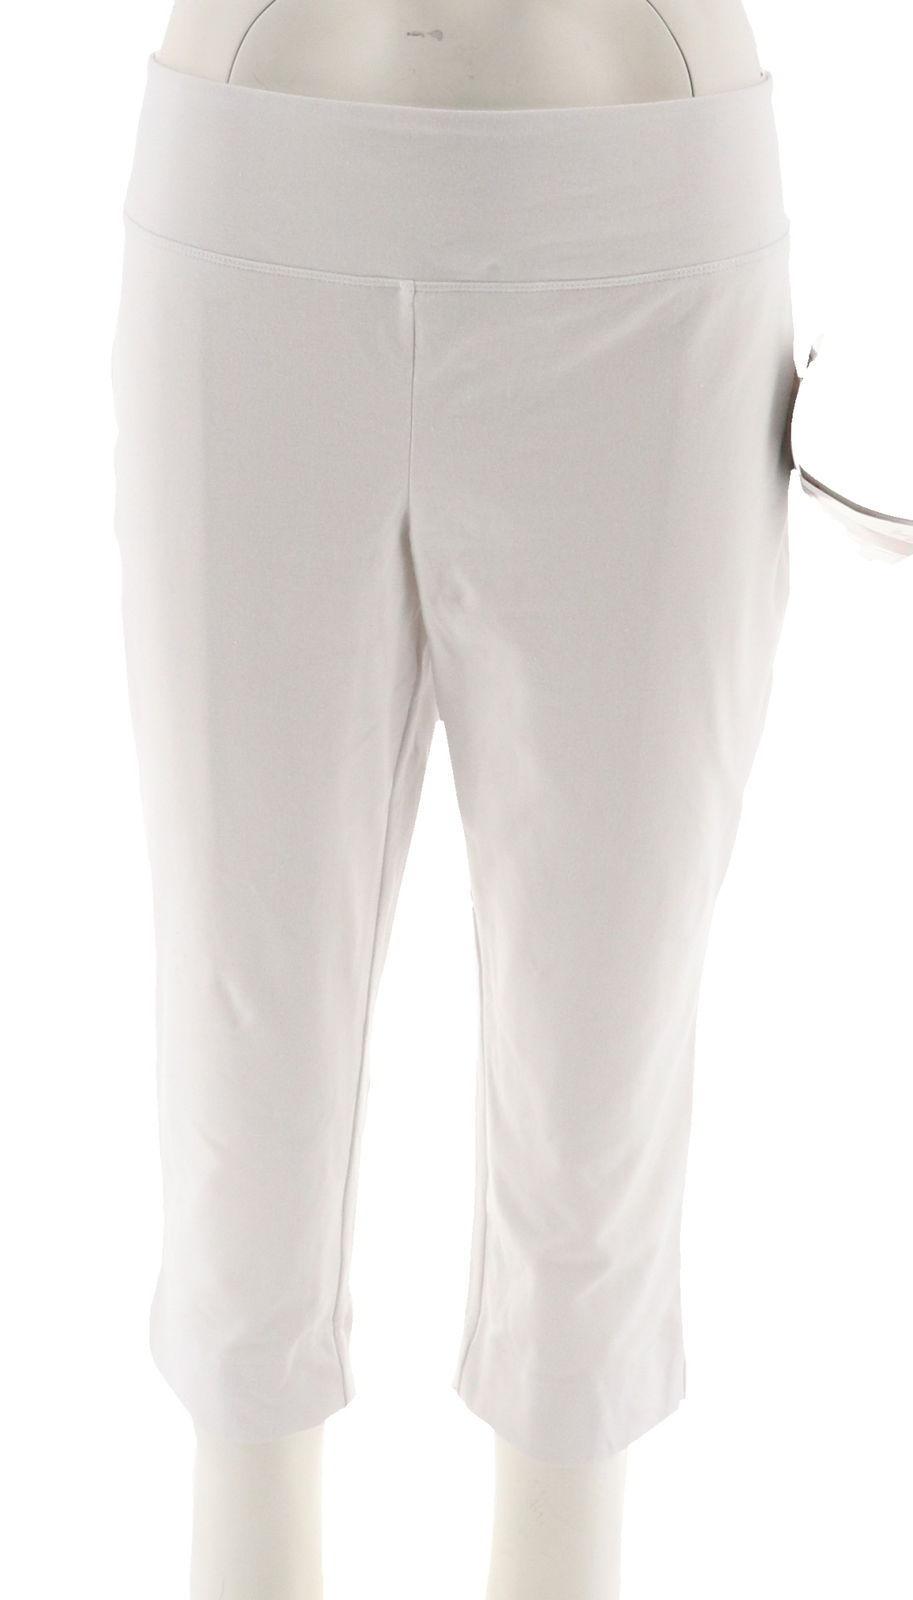 595a3e970c43c Wicked Women Control Capri Pants Elastic Waistband Alabaster M NEW A288782  - $21.76